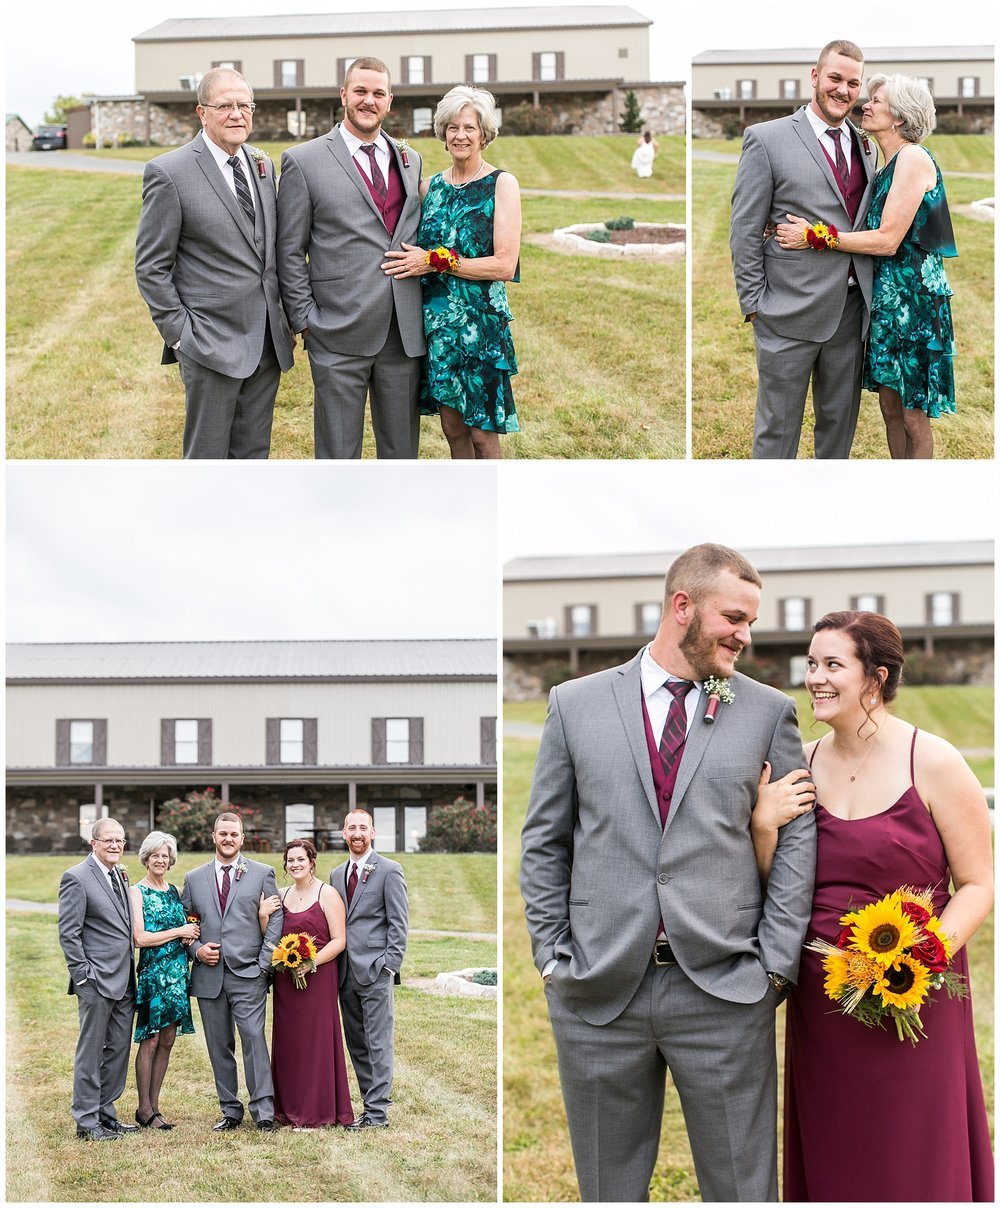 M+K Lodges at Gettysburg Wedding LivingRadiantPhotographyphotos_0025.jpg